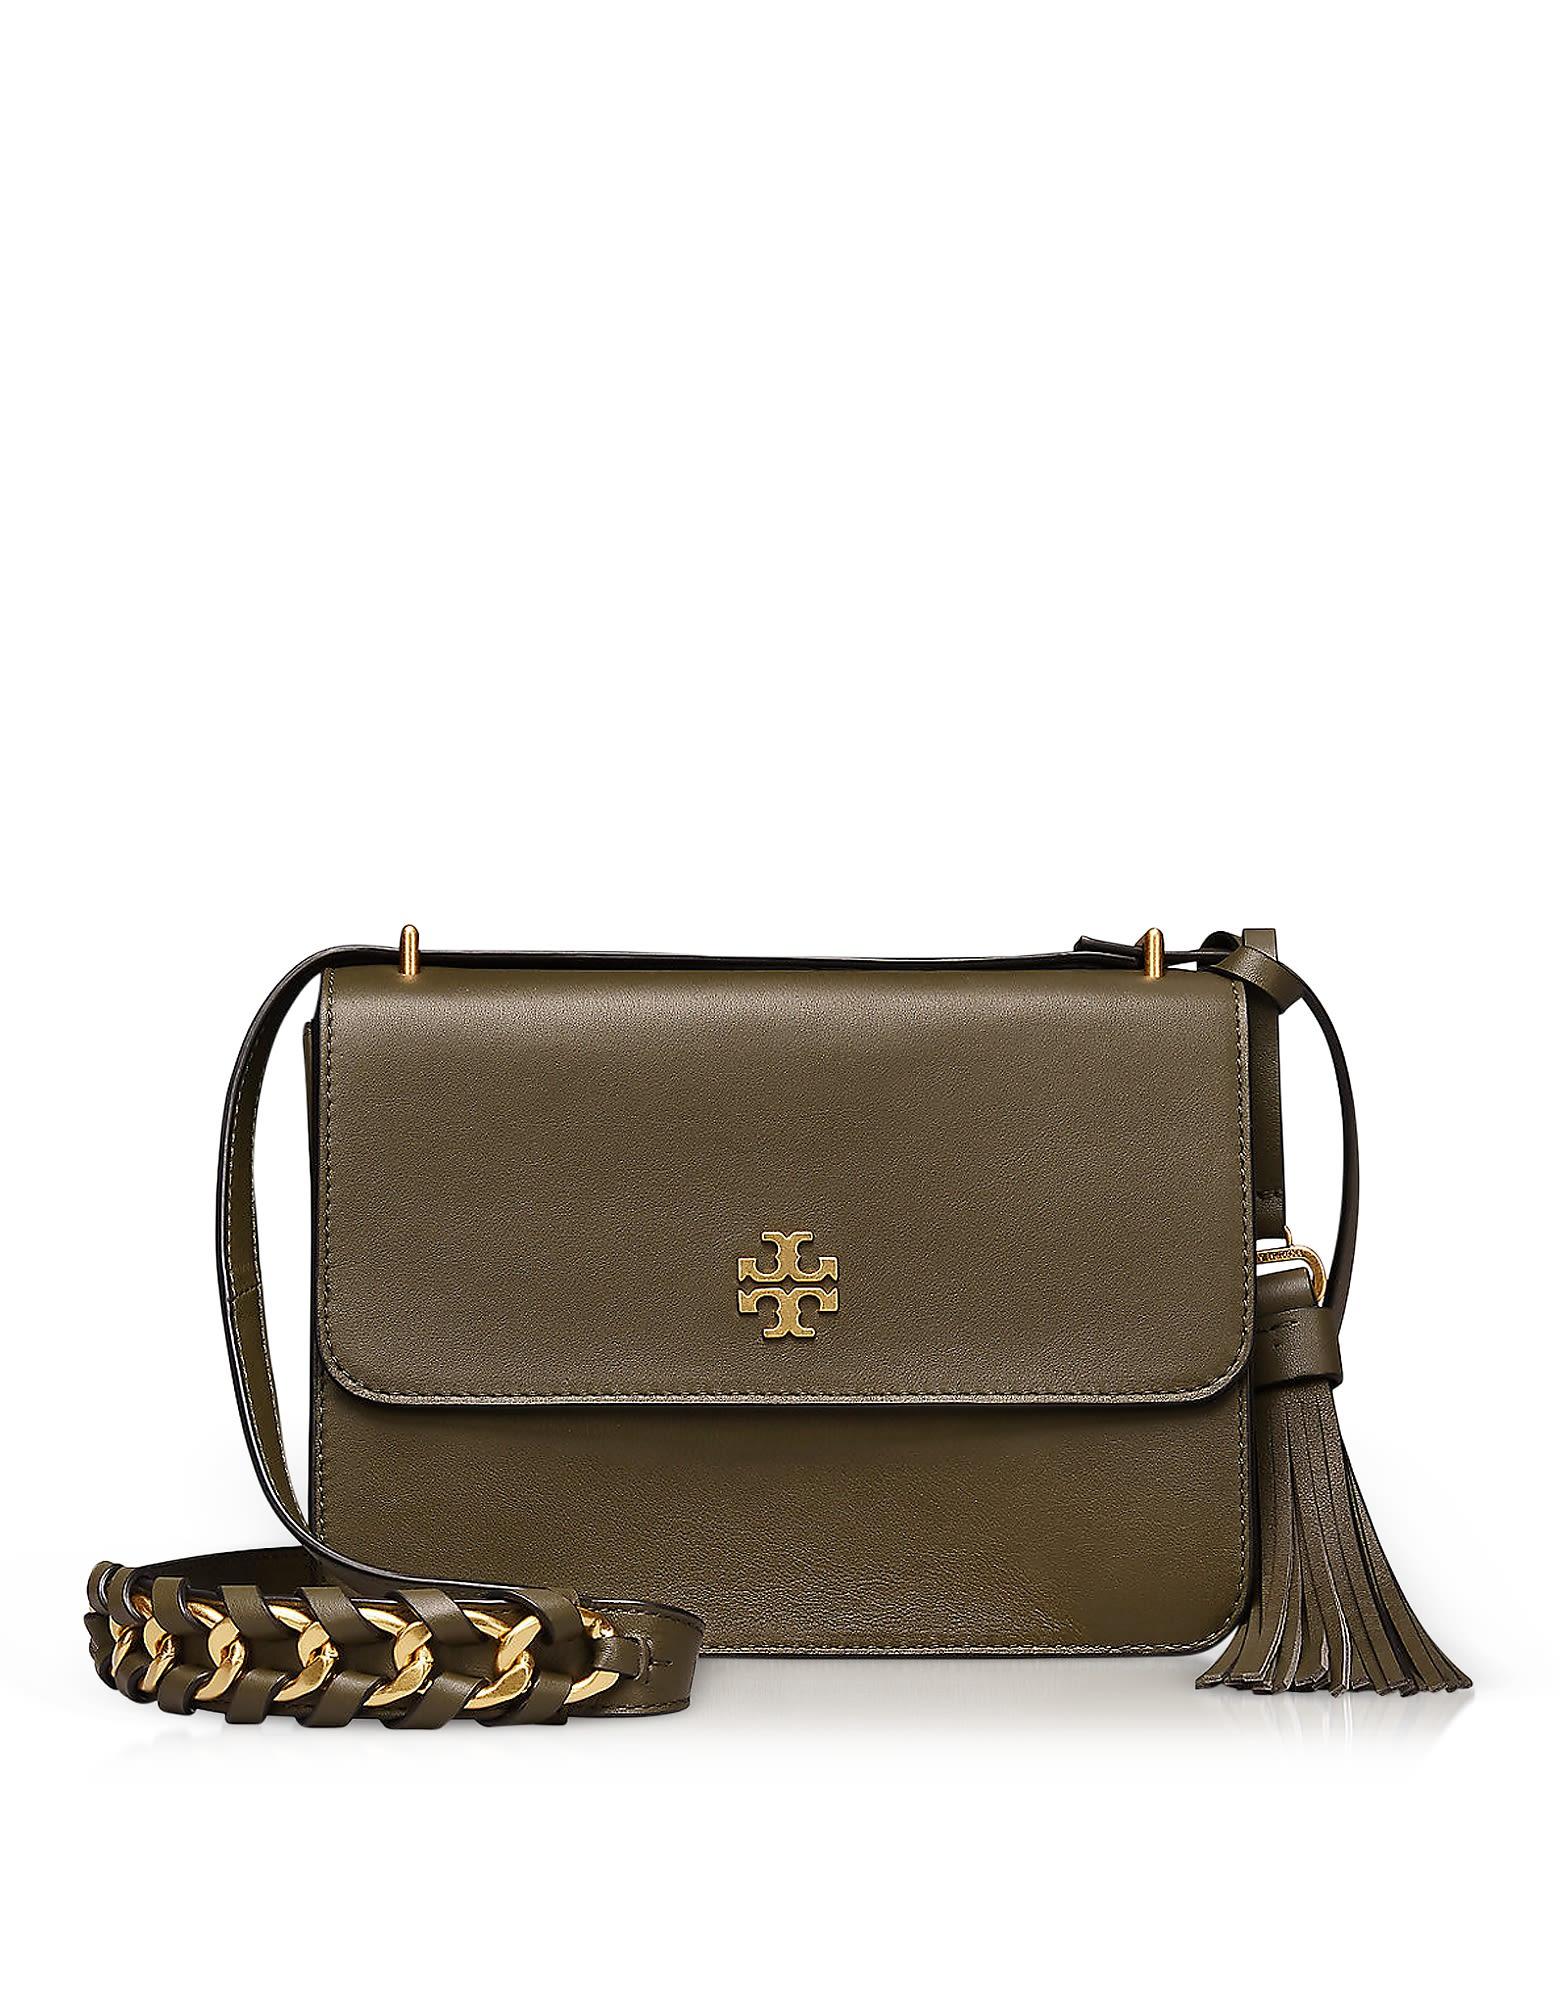 edc7246fad2f Tory Burch Brooke Leccio Leather Shoulder Bag In Green